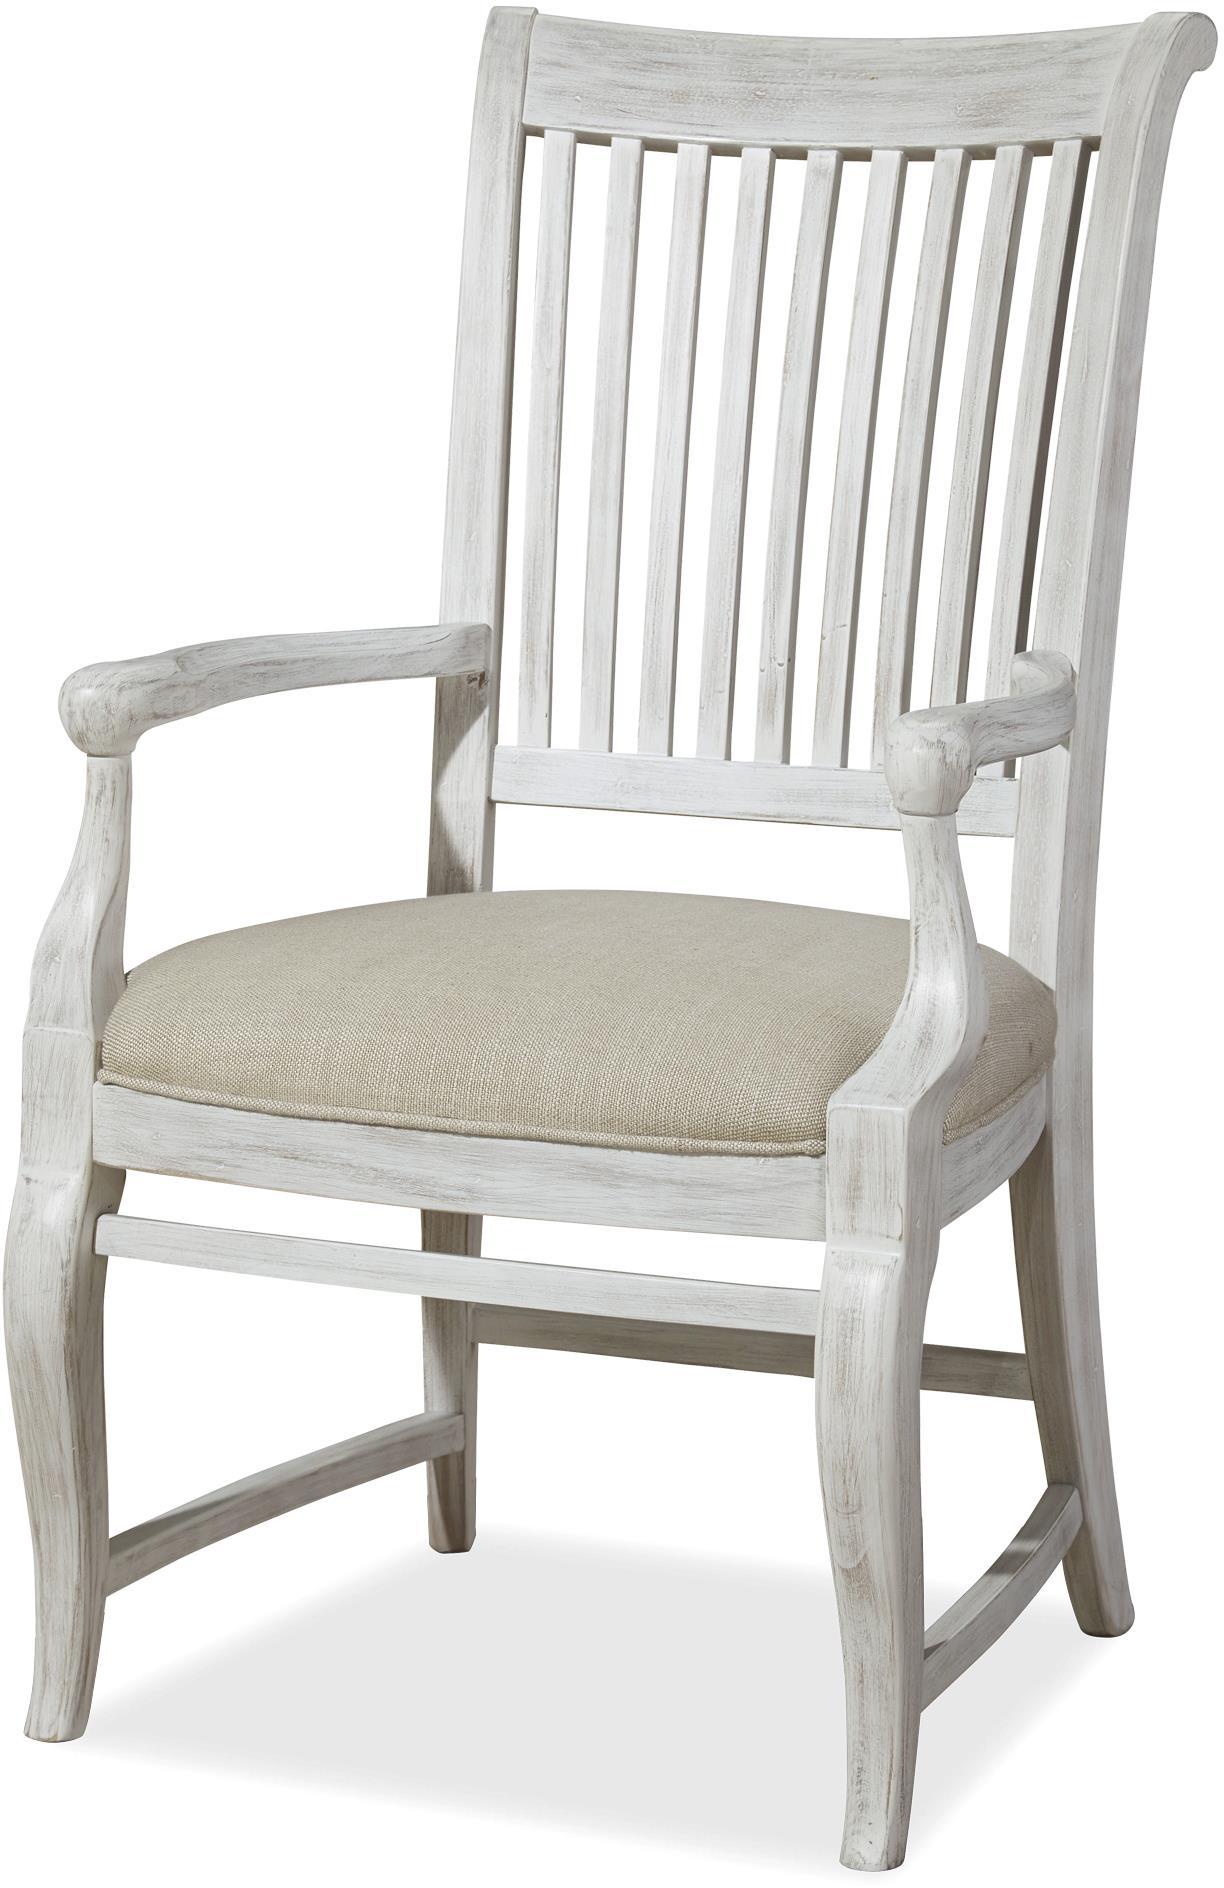 Paula Deen by Universal Dogwood Dogwood Arm Chair - Item Number: 597635-RTA